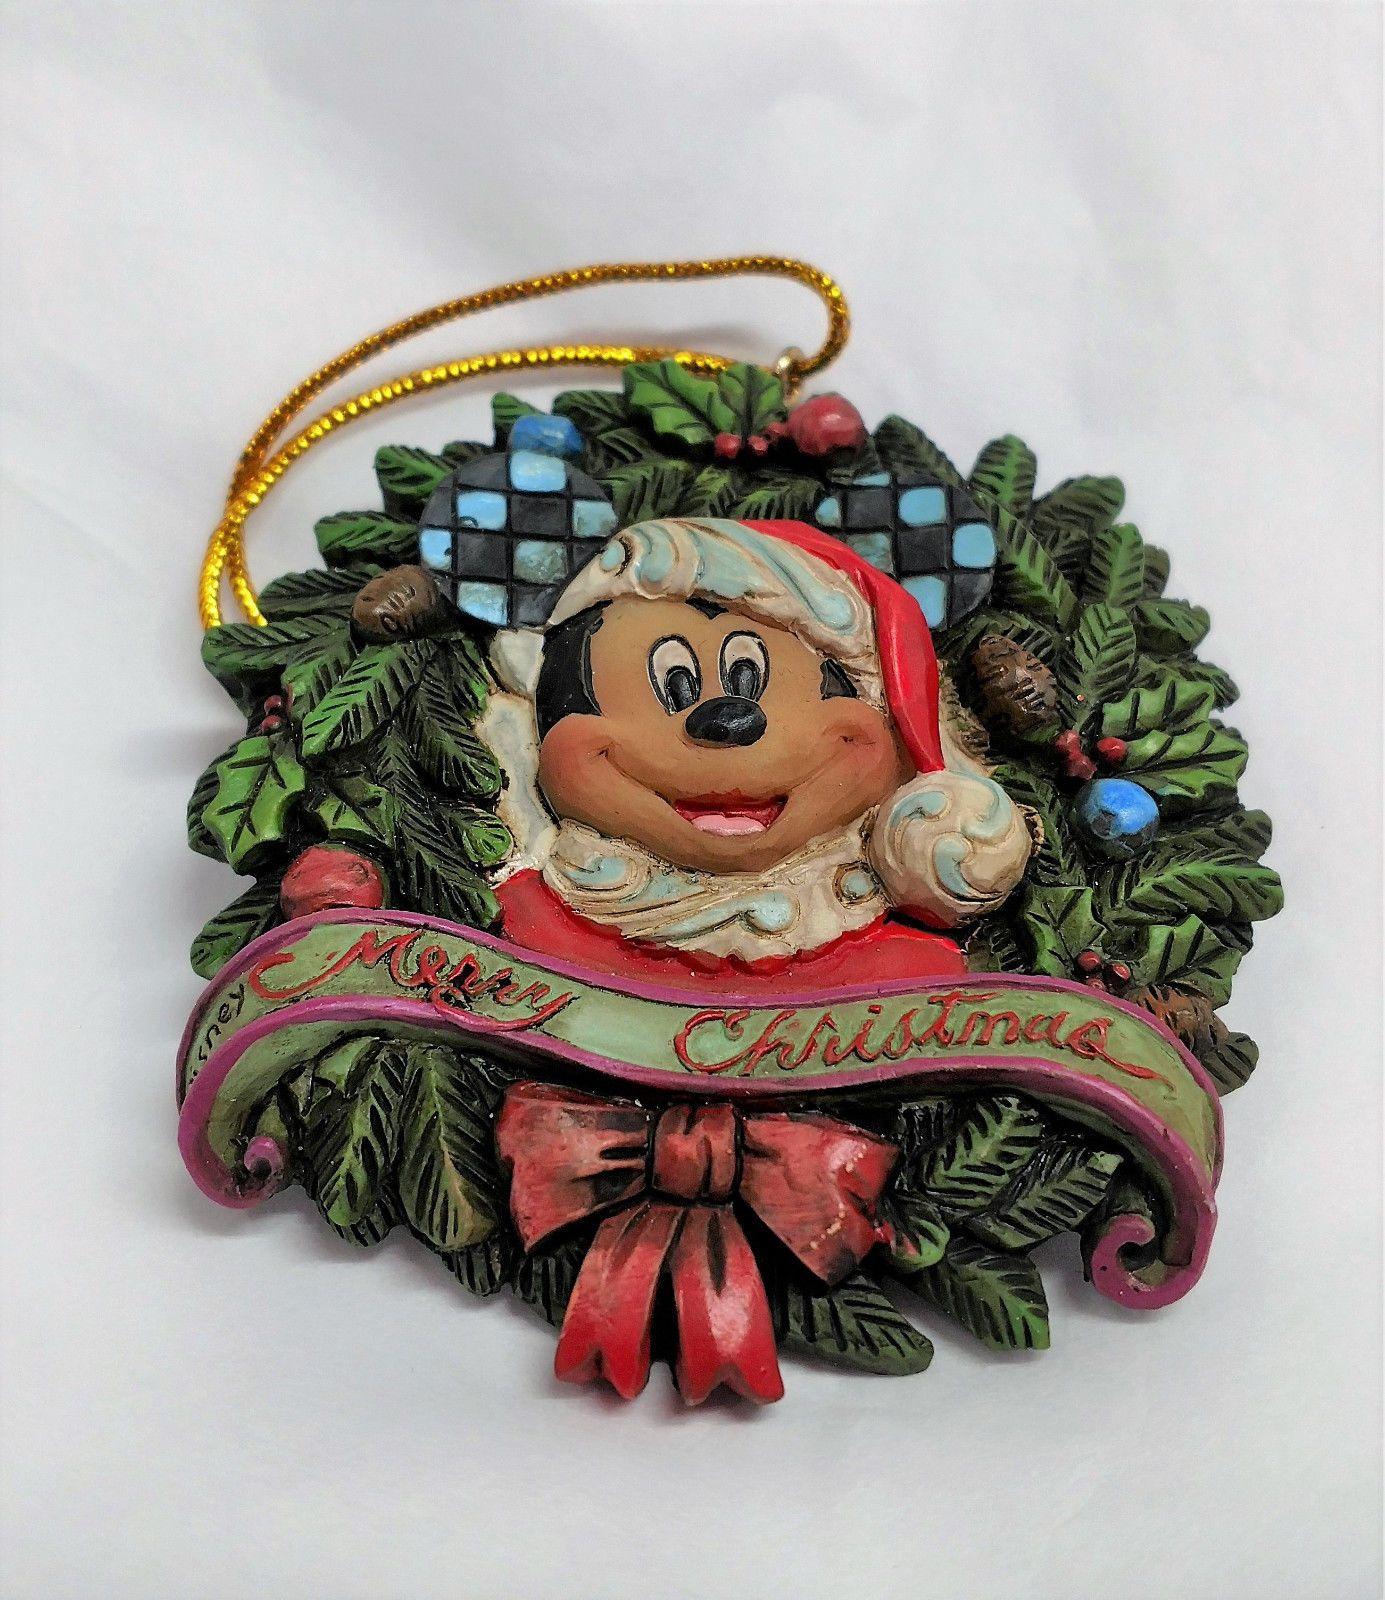 Jim Shore DISNEY Christmas Wreath Mickey Mouse Ornament https://t.co/XqSFF9gkpk #Mickey